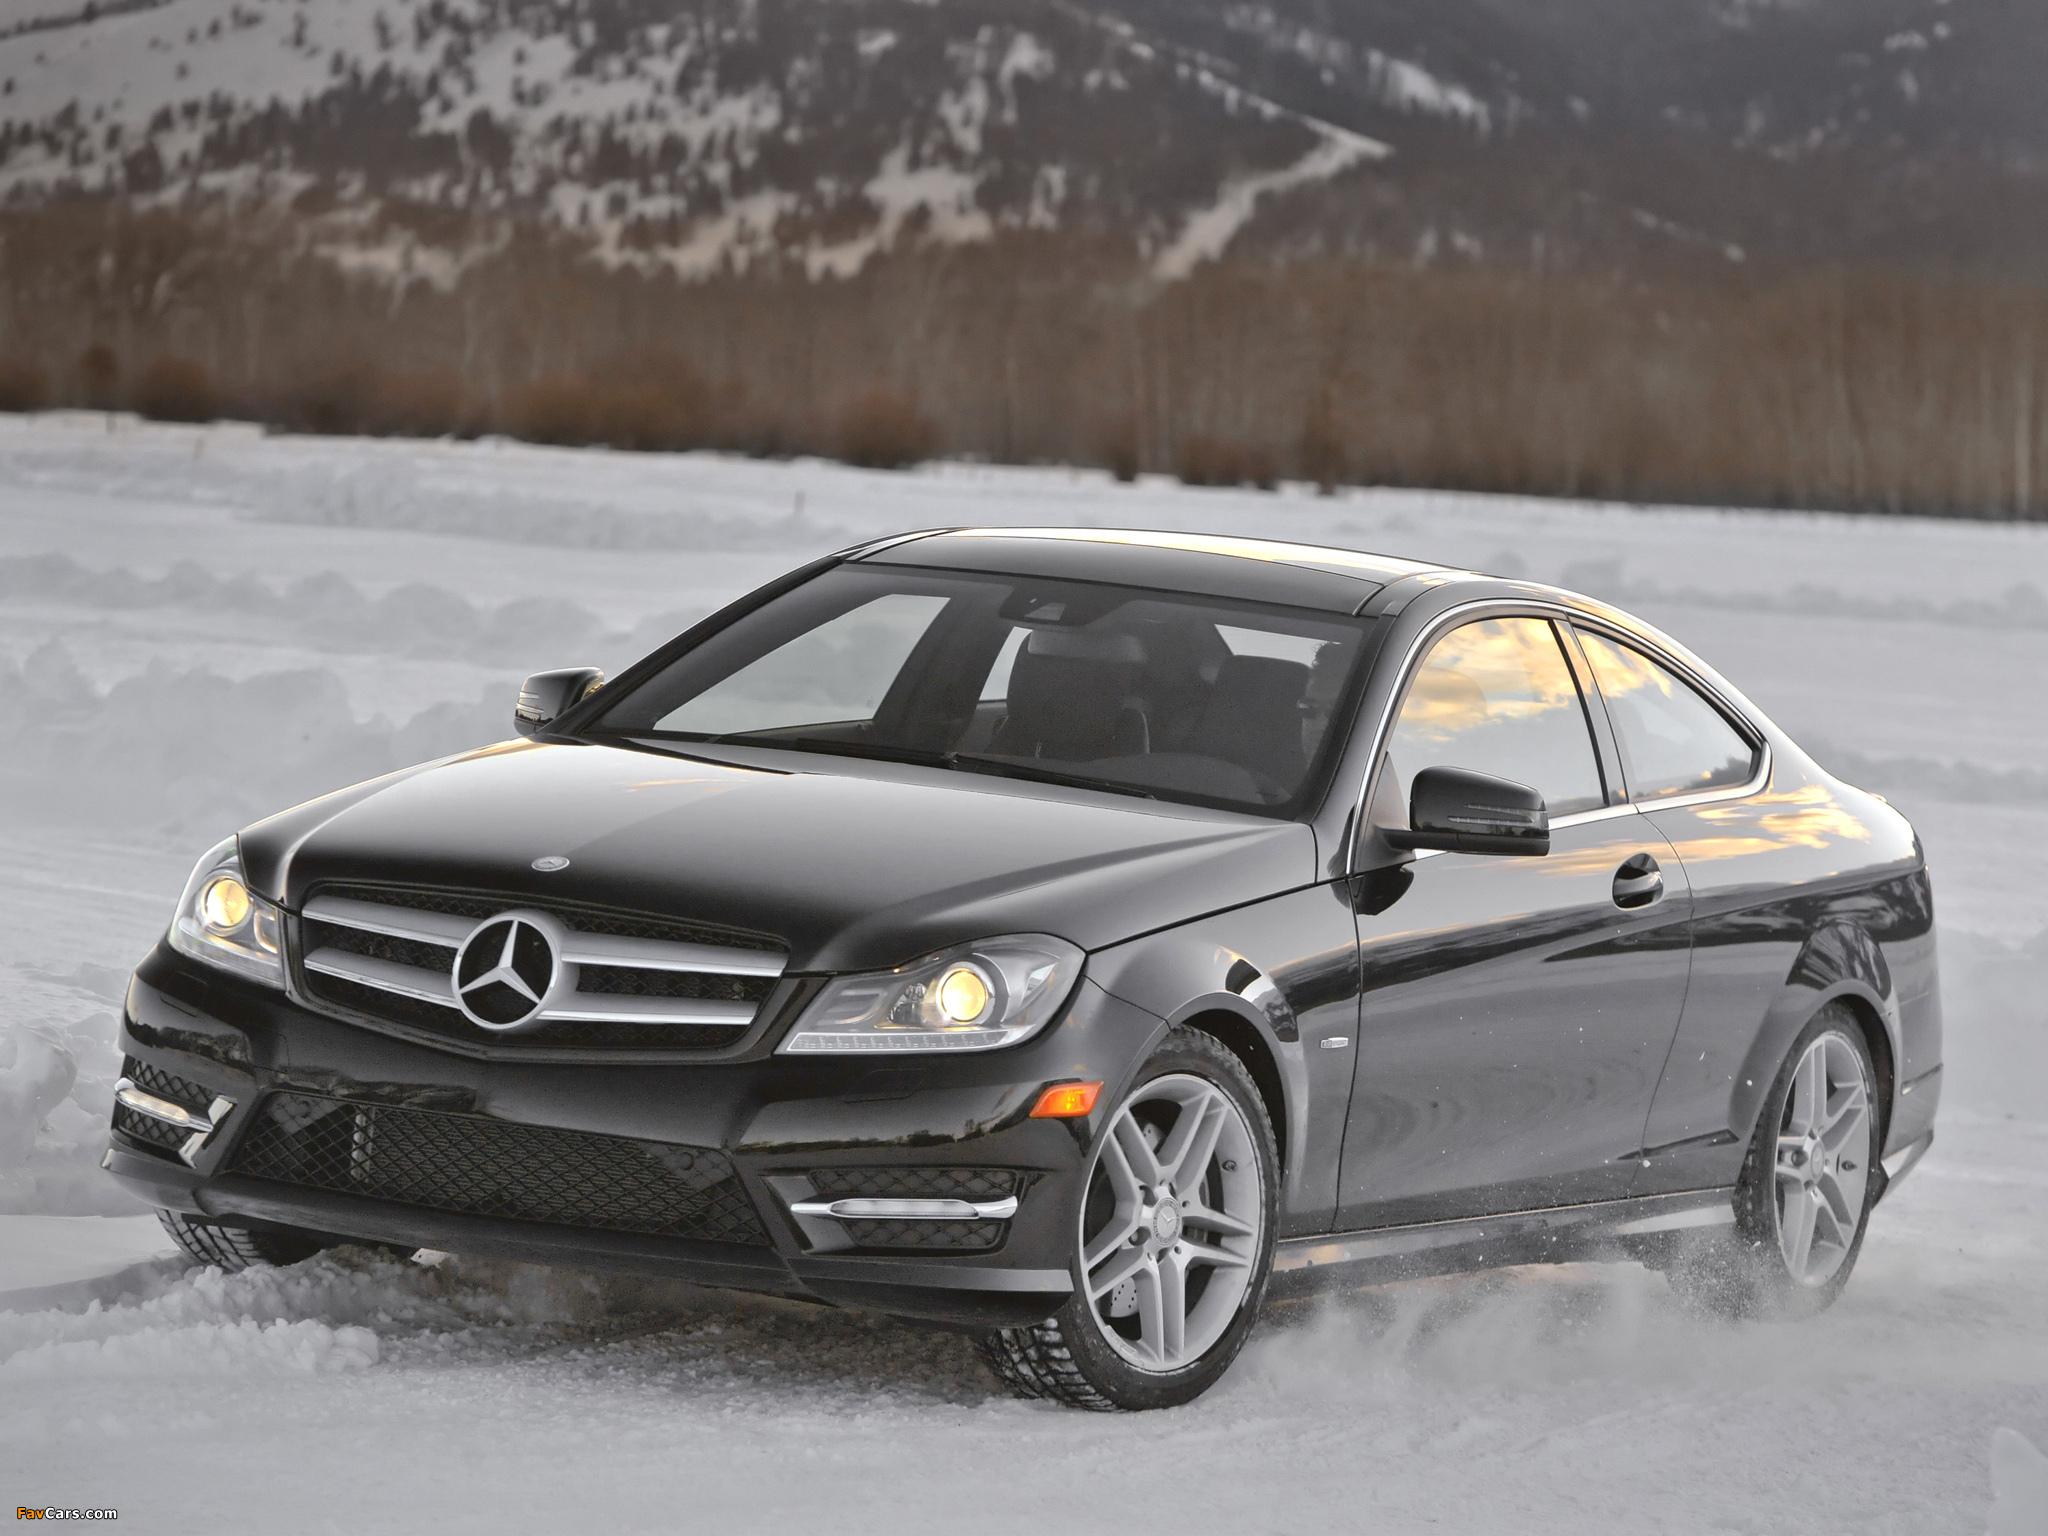 Mercedes-Benz C 350 4MATIC Coupe US-spec (C204) 2011 photos (2048 x 1536)